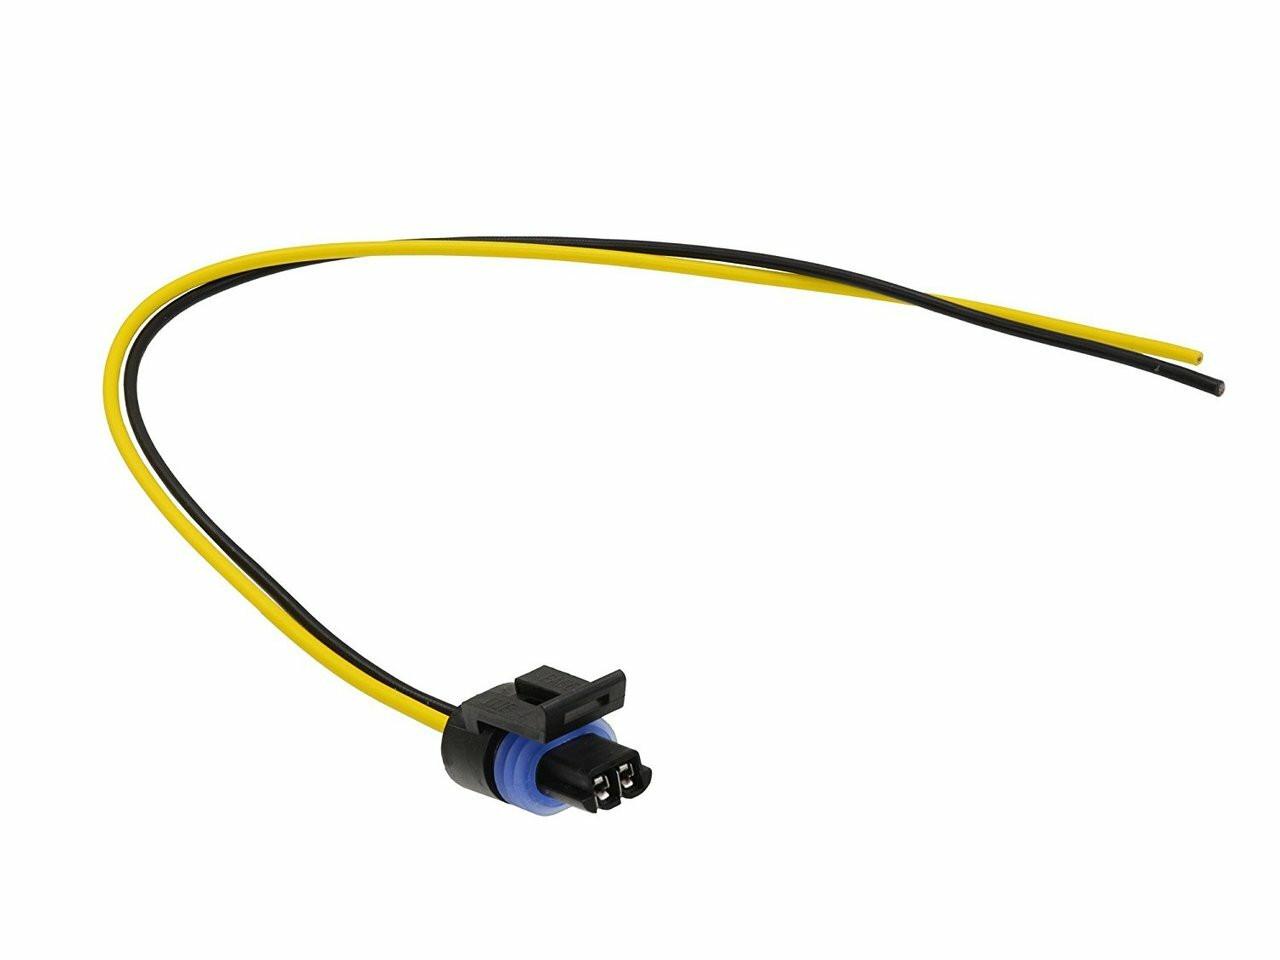 T56 Connector Set of 3 Backup, Reverse Lockout, VSS Wiring Pigtail GM LT1 LS1 Camaro, Firebird, etc